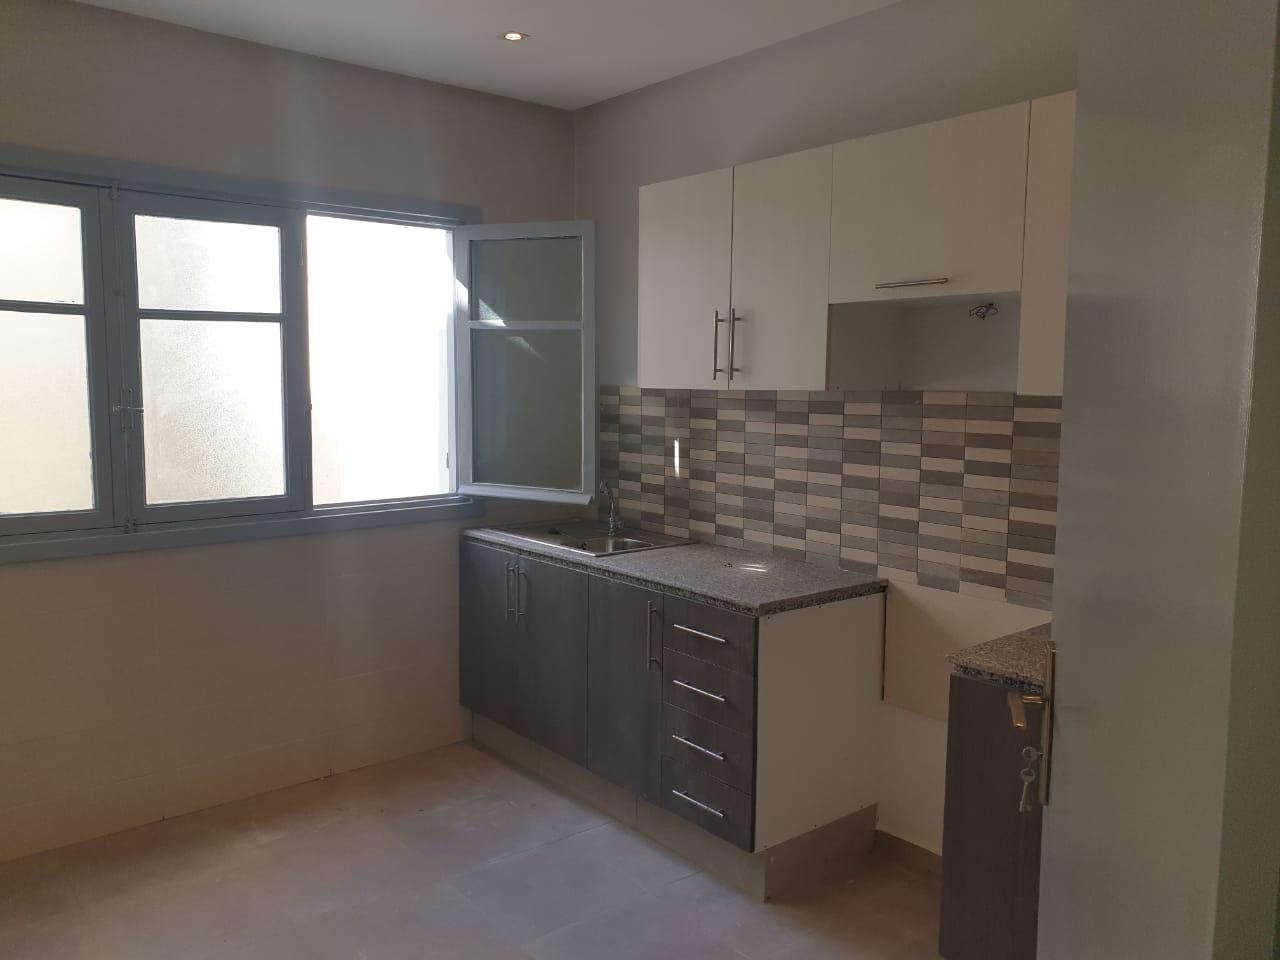 A vendre appartement 100 M² 3Ch+ salon au Maarif